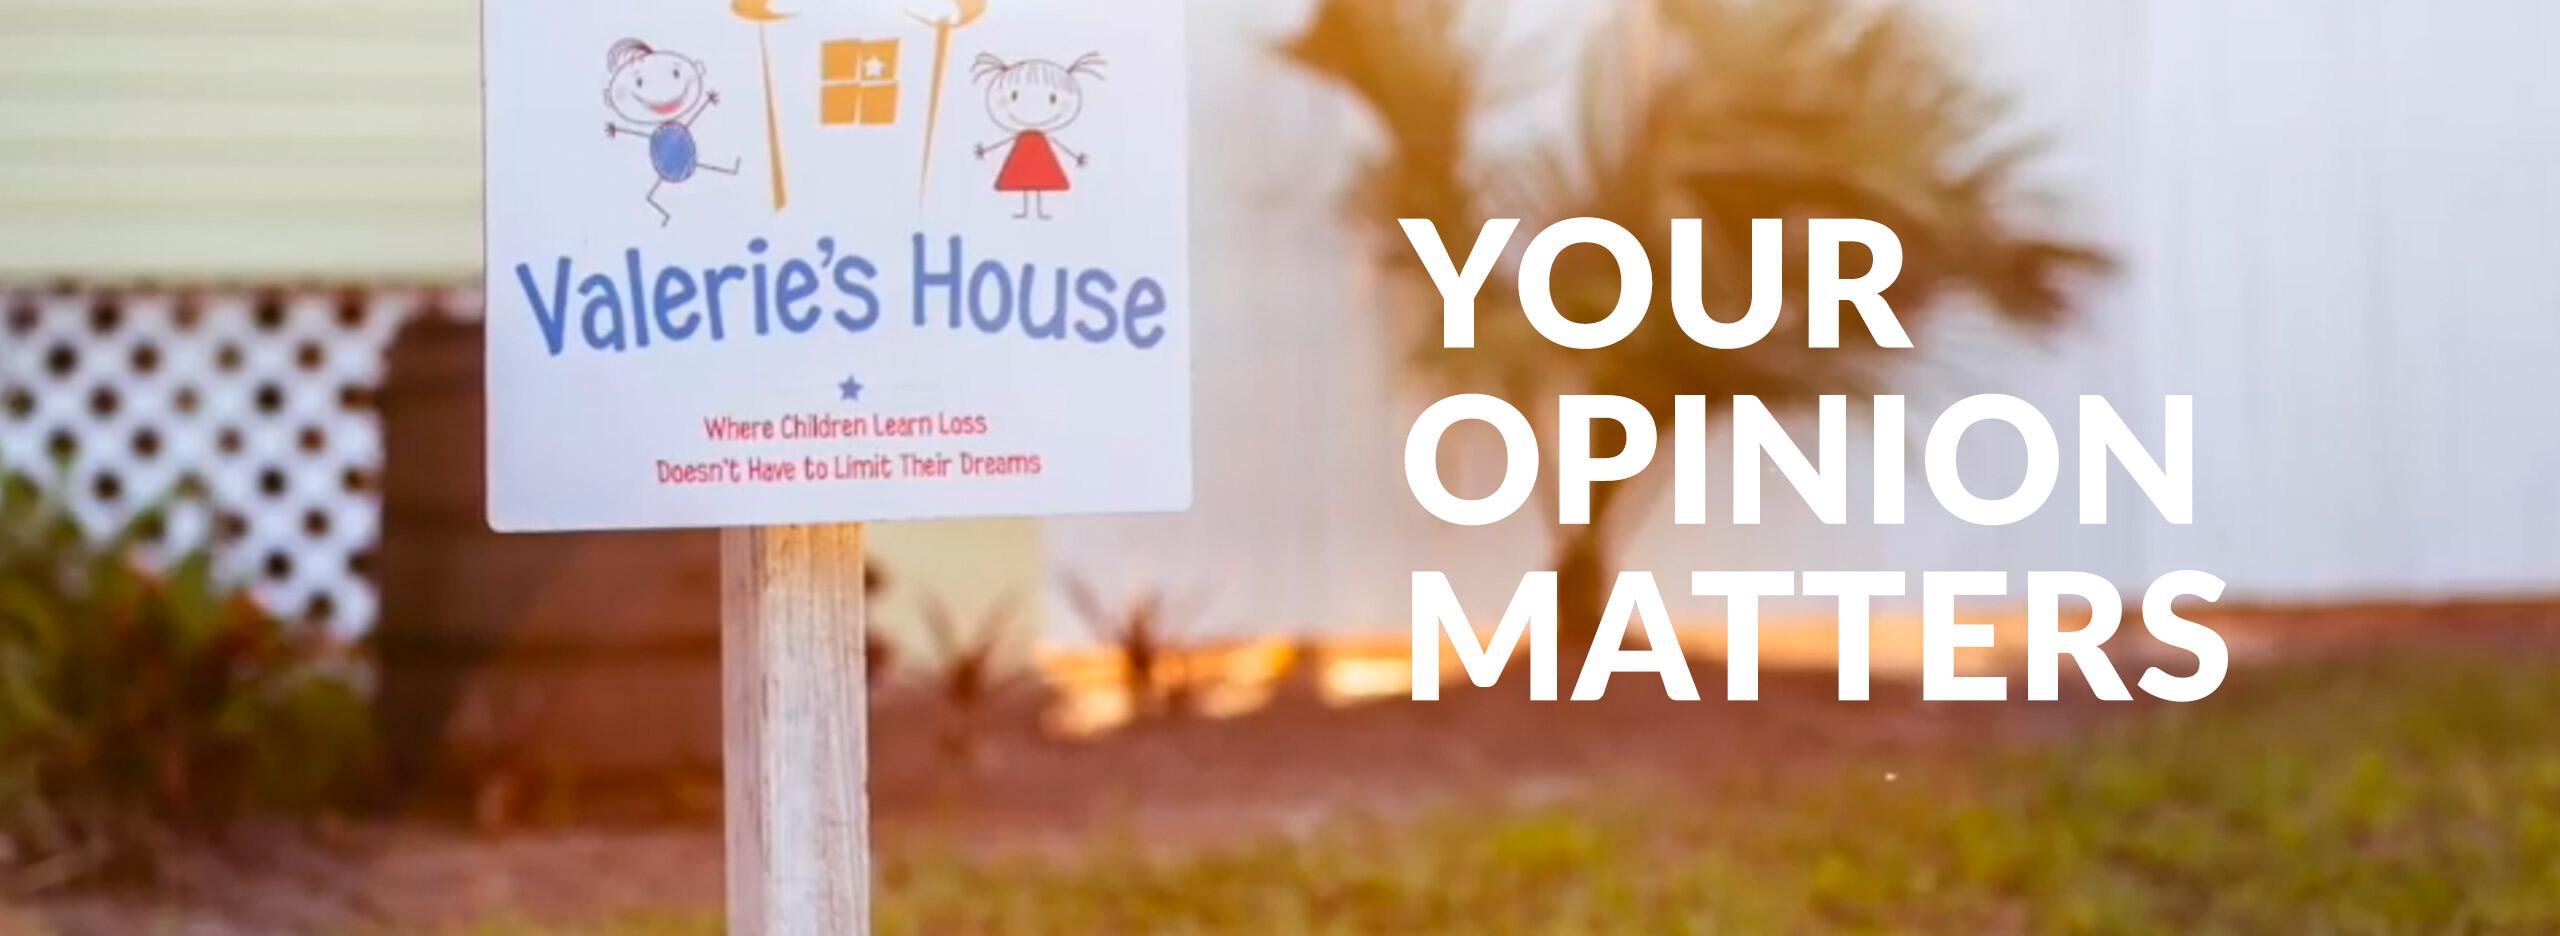 Valerie's House Executive Audit Survey header | Valerie's House